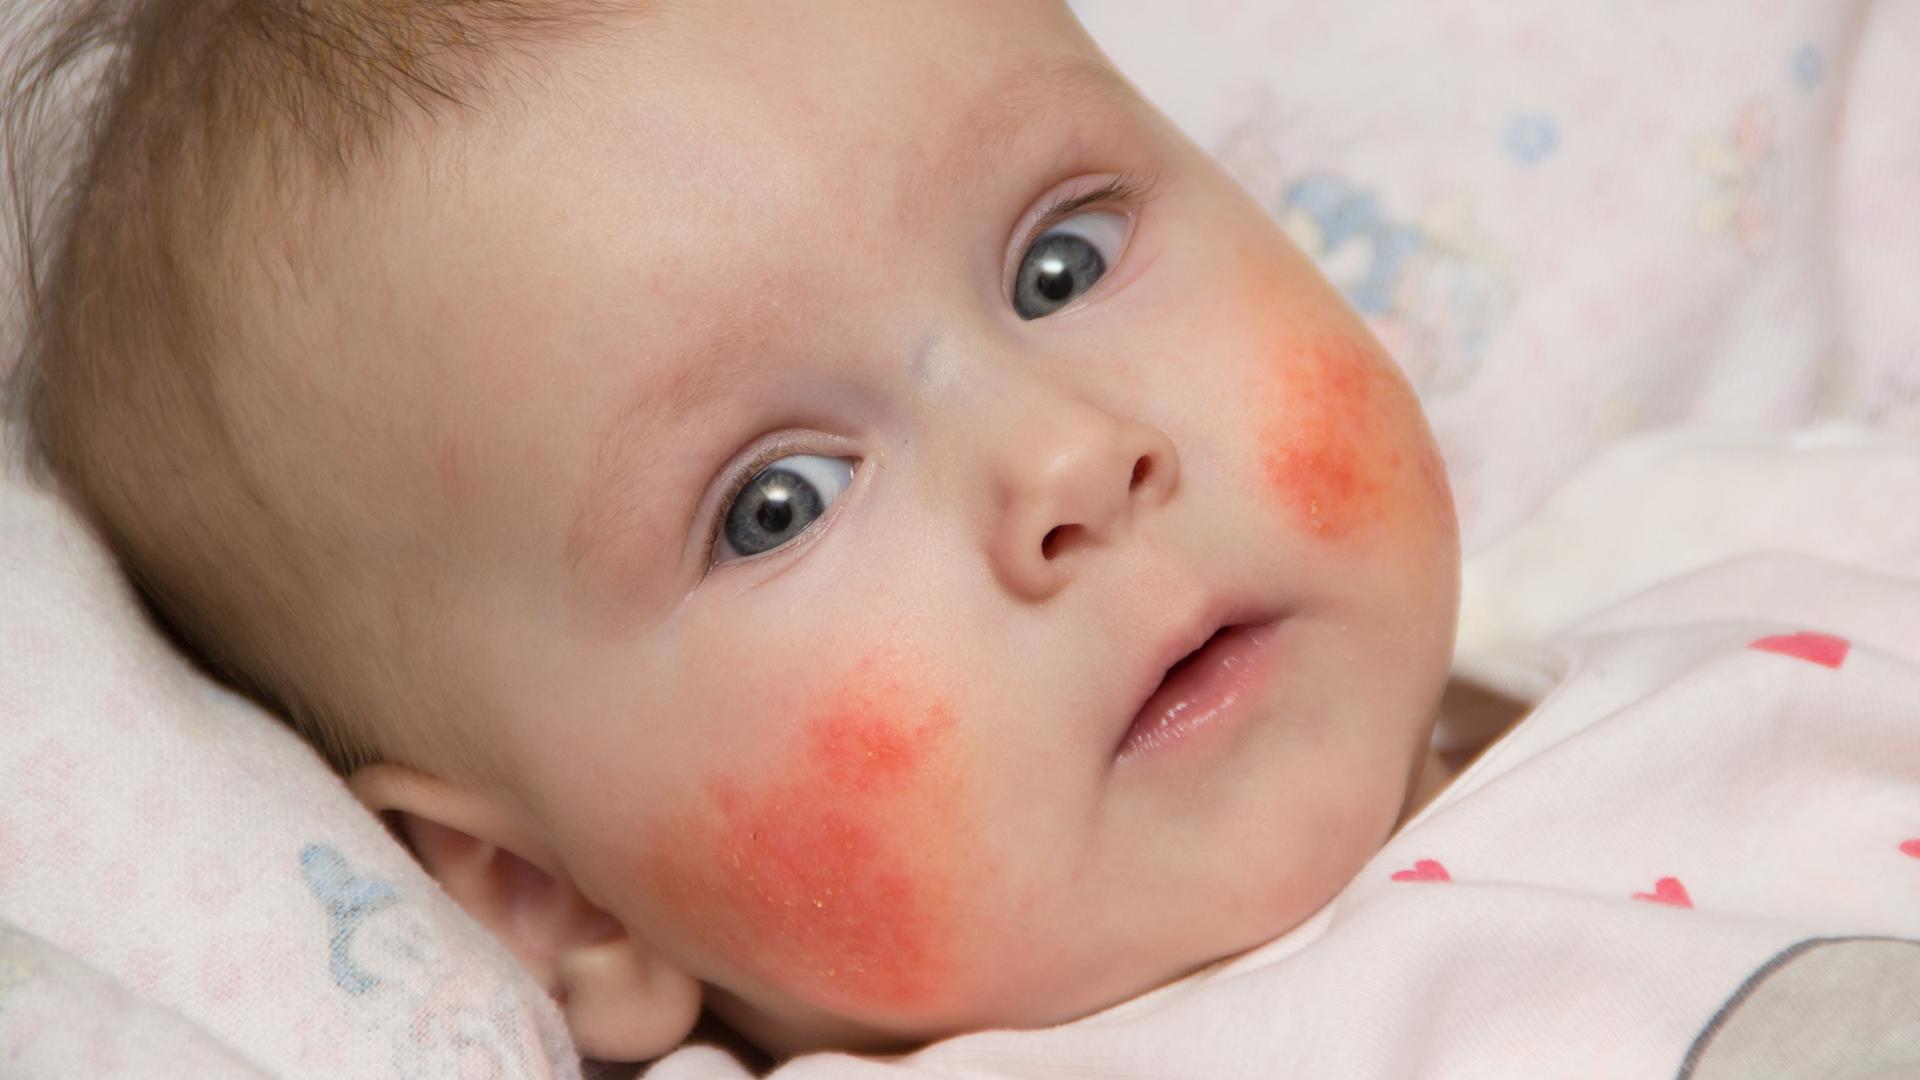 Eczema in babies - BabyCenter Canada